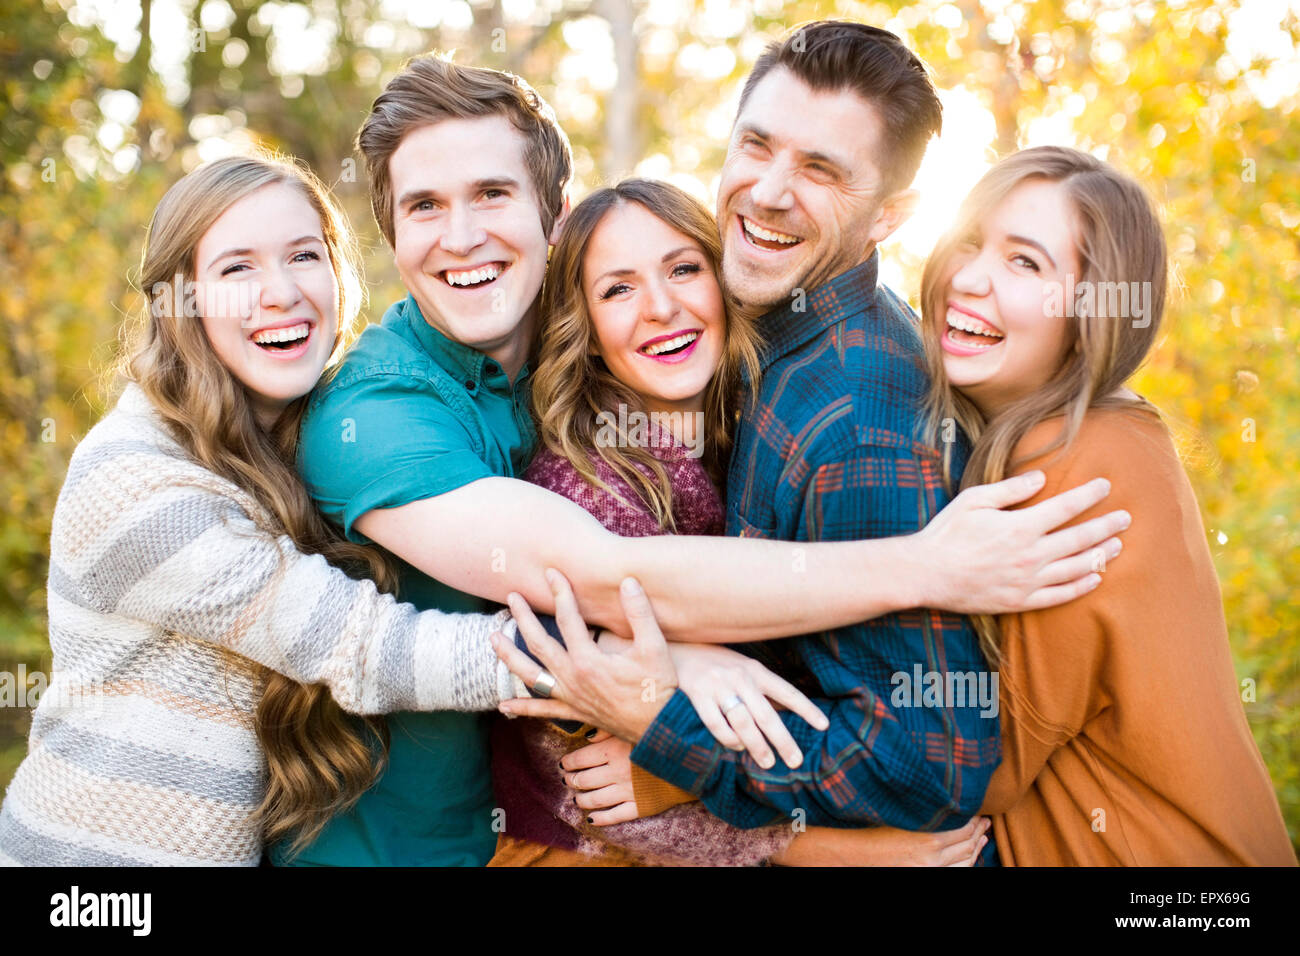 Portrait of five smiling friends - Stock Image